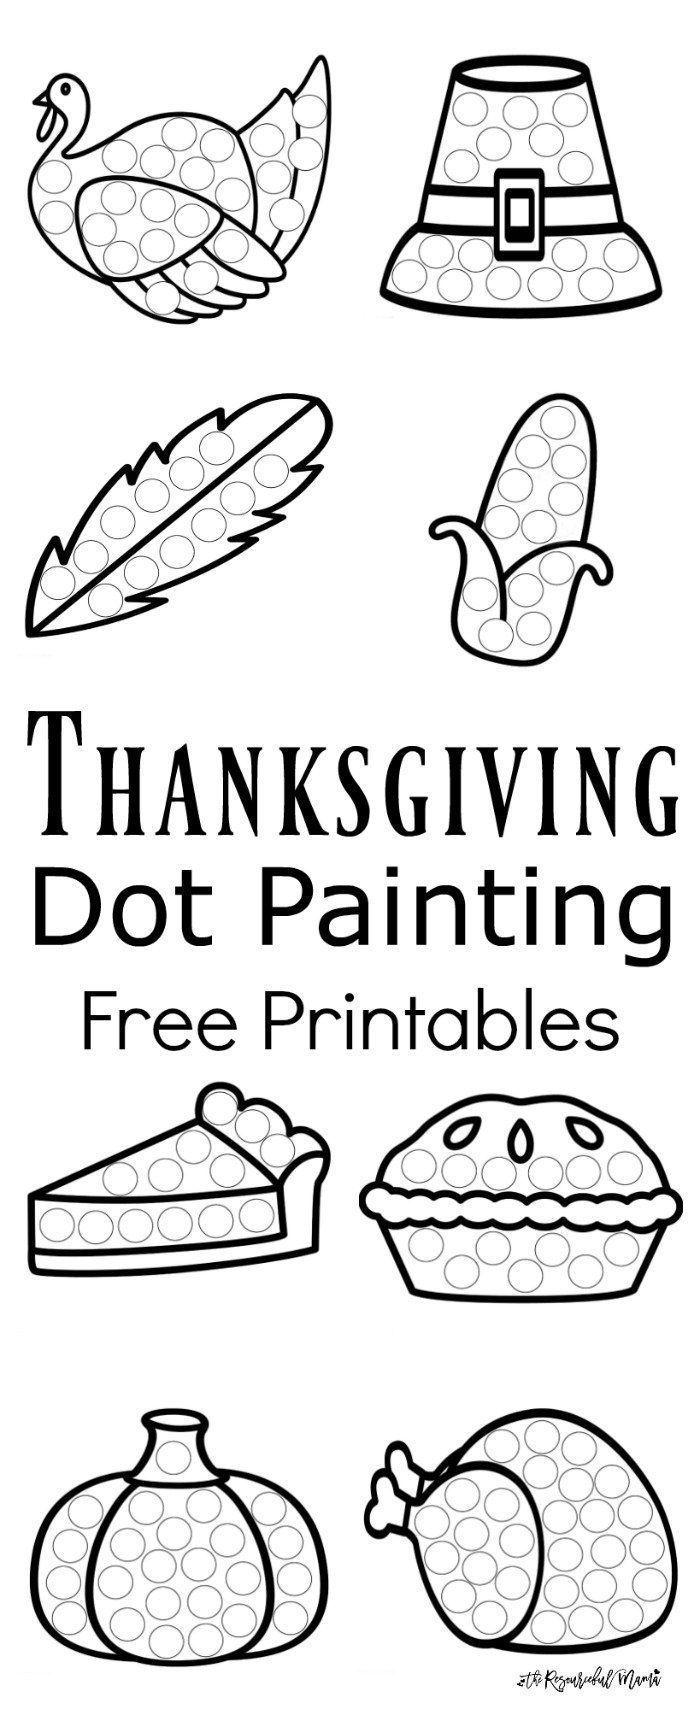 Predownload: Thanksgiving Dot Painting Free Printables In 2020 Thanksgiving Preschool Thanksgiving Lessons Thanksgiving School [ 1709 x 700 Pixel ]